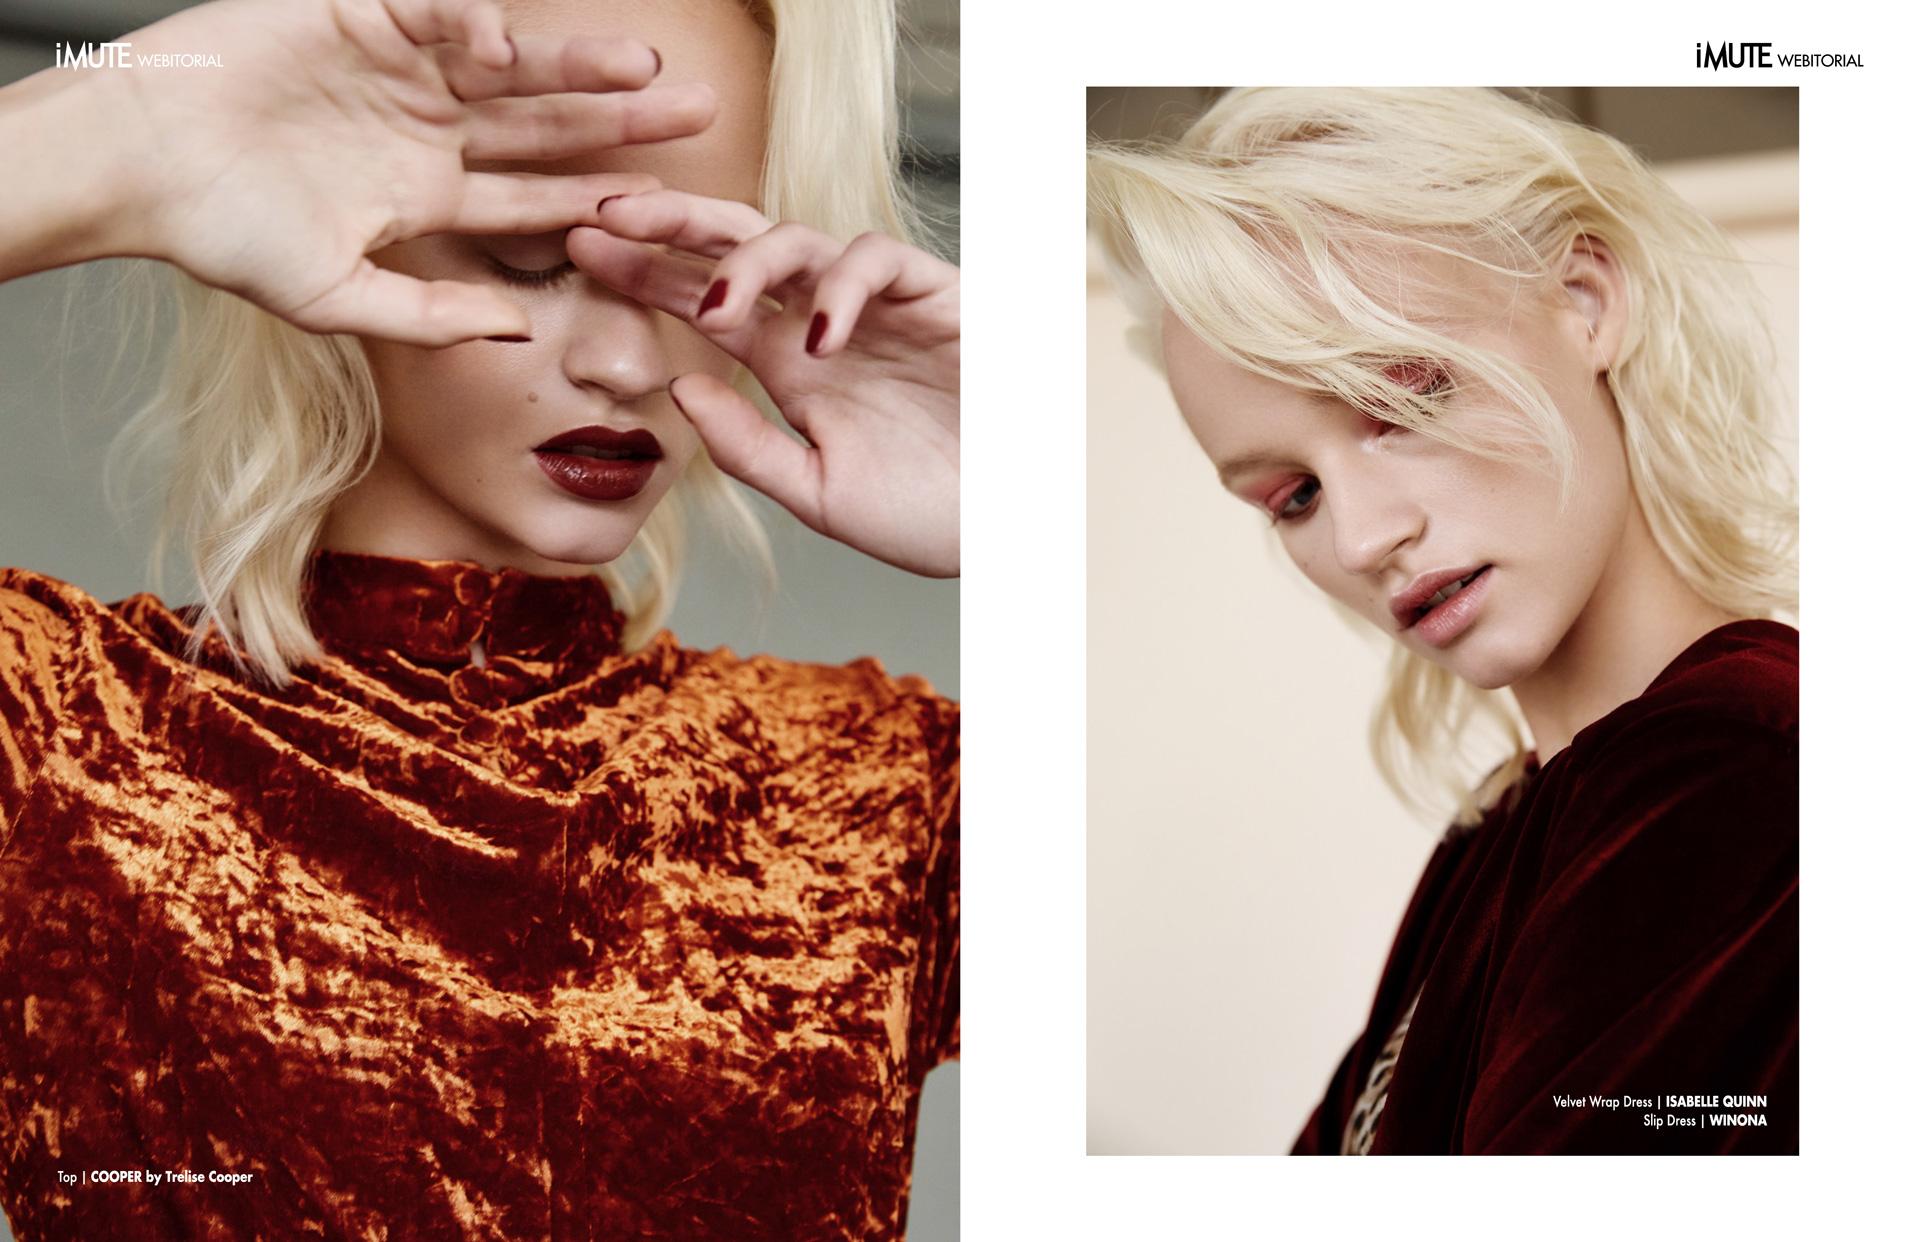 from Denmark with love webitorial for iMute Magazine1  Photographer|Carlo Fernandes Model| Cecilie Heide @Chadwicks Stylist|Lauren Jones Makeup|Kelly Bowman@Reload Agency Hair|Darren Summors